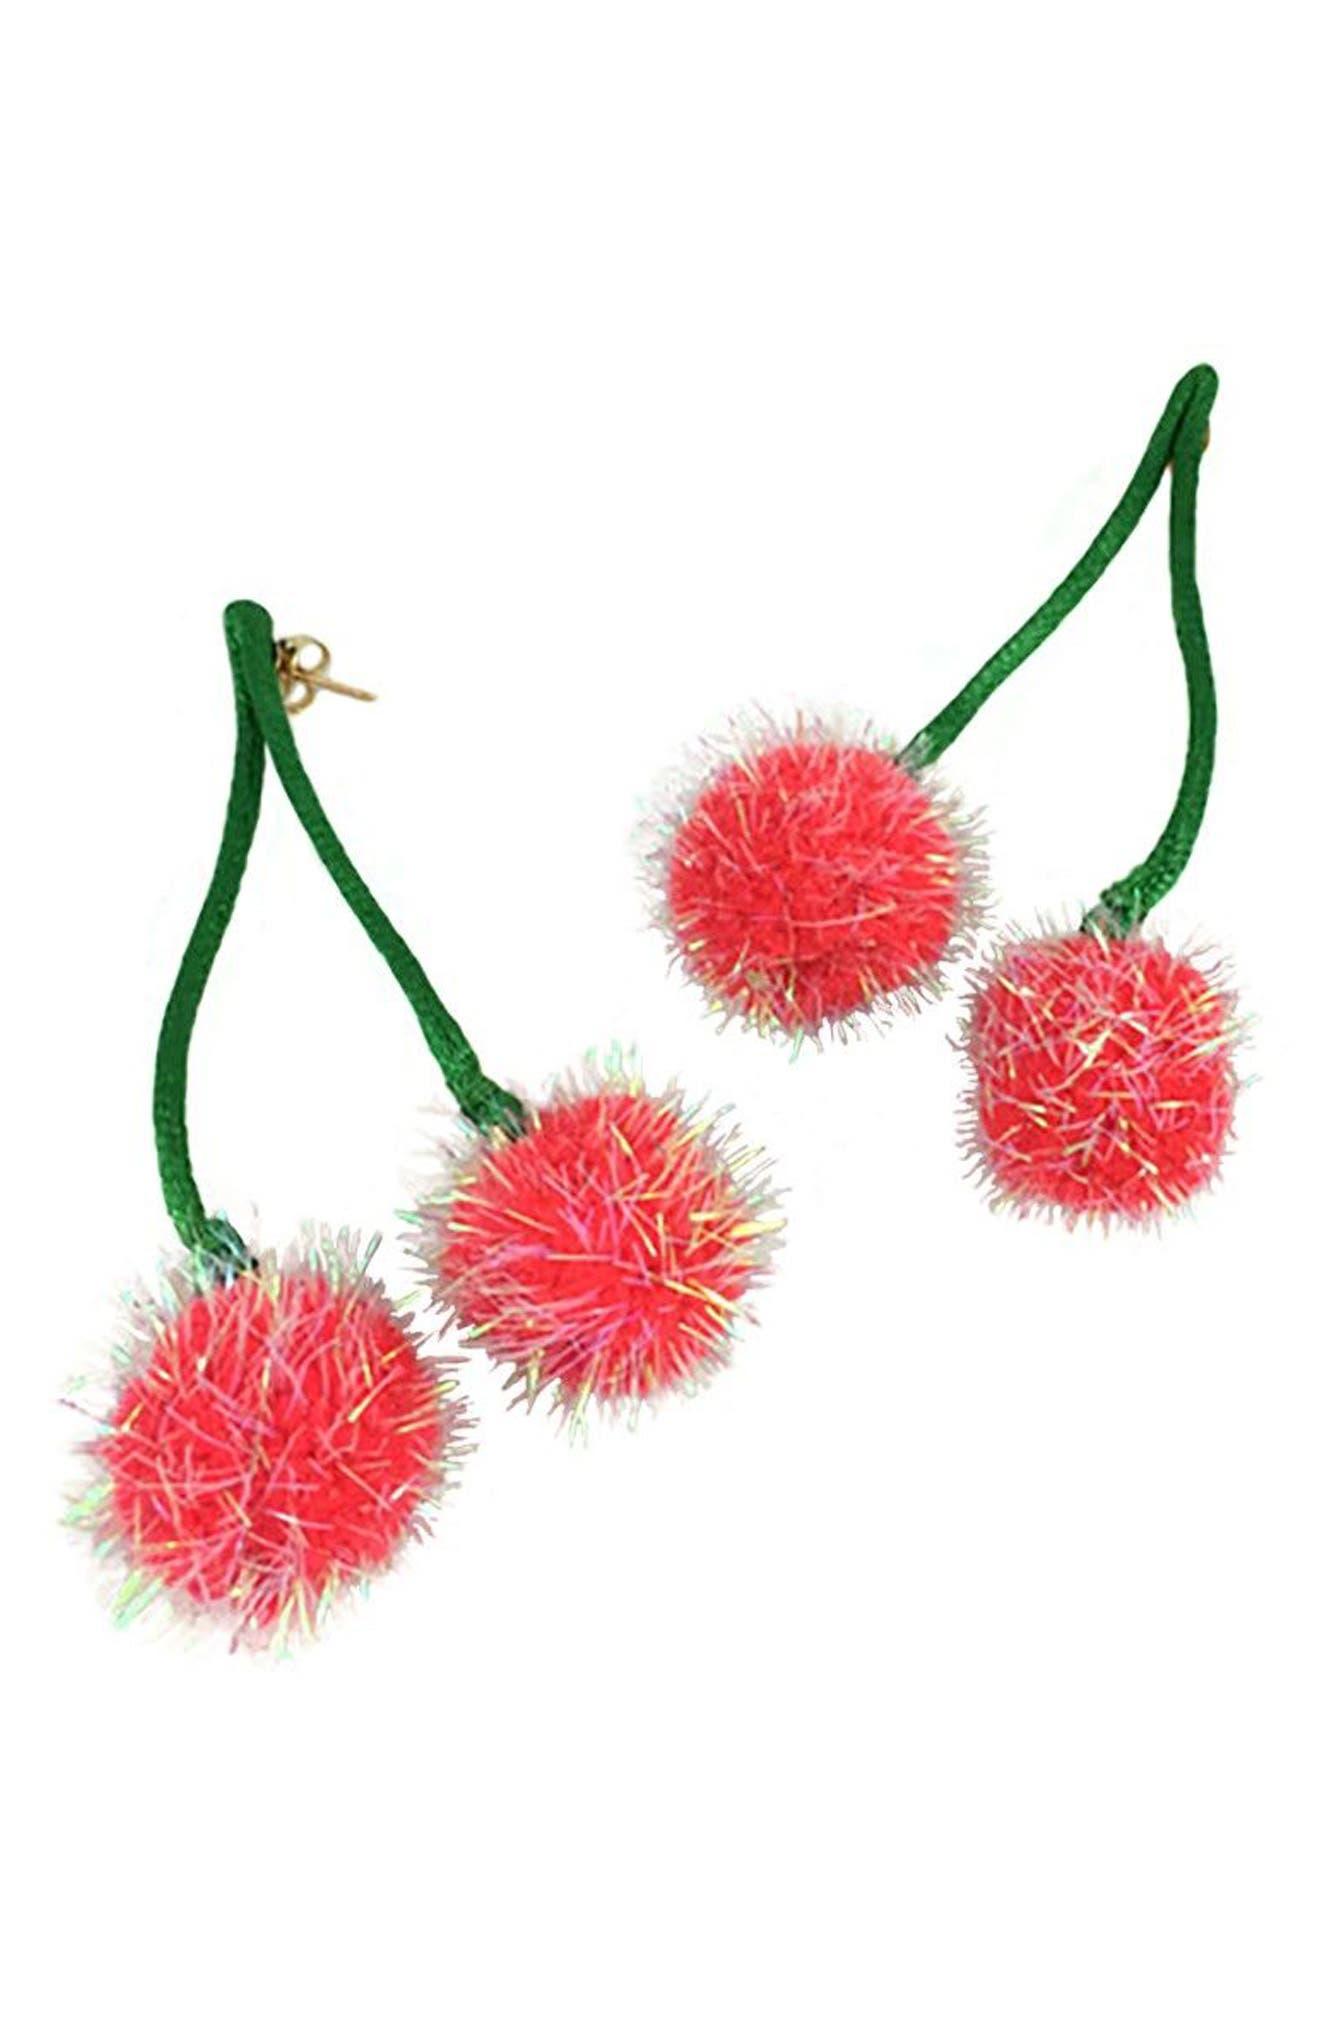 Alternate Image 1 Selected - DadyBones Cherry Bomb Earrings